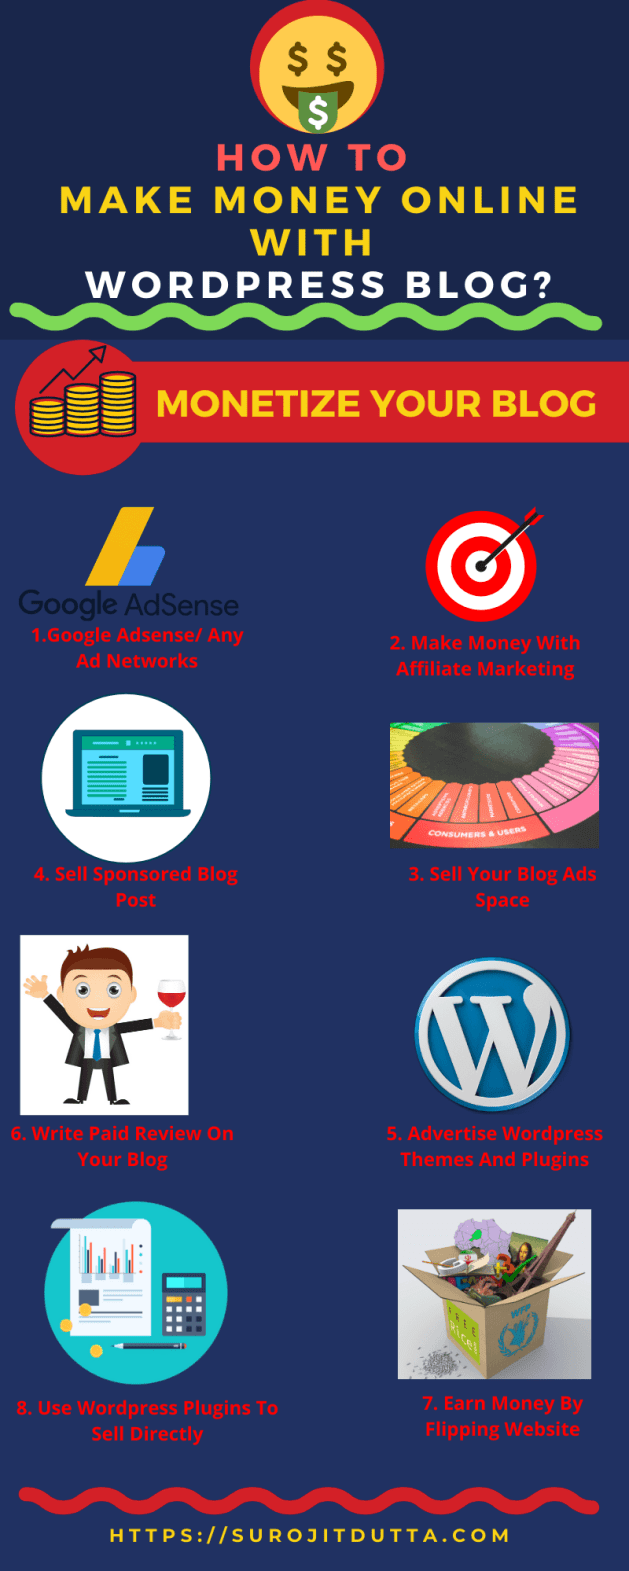 Make Money Online Through Monetization Of Your Blog - Surojitdutta.com